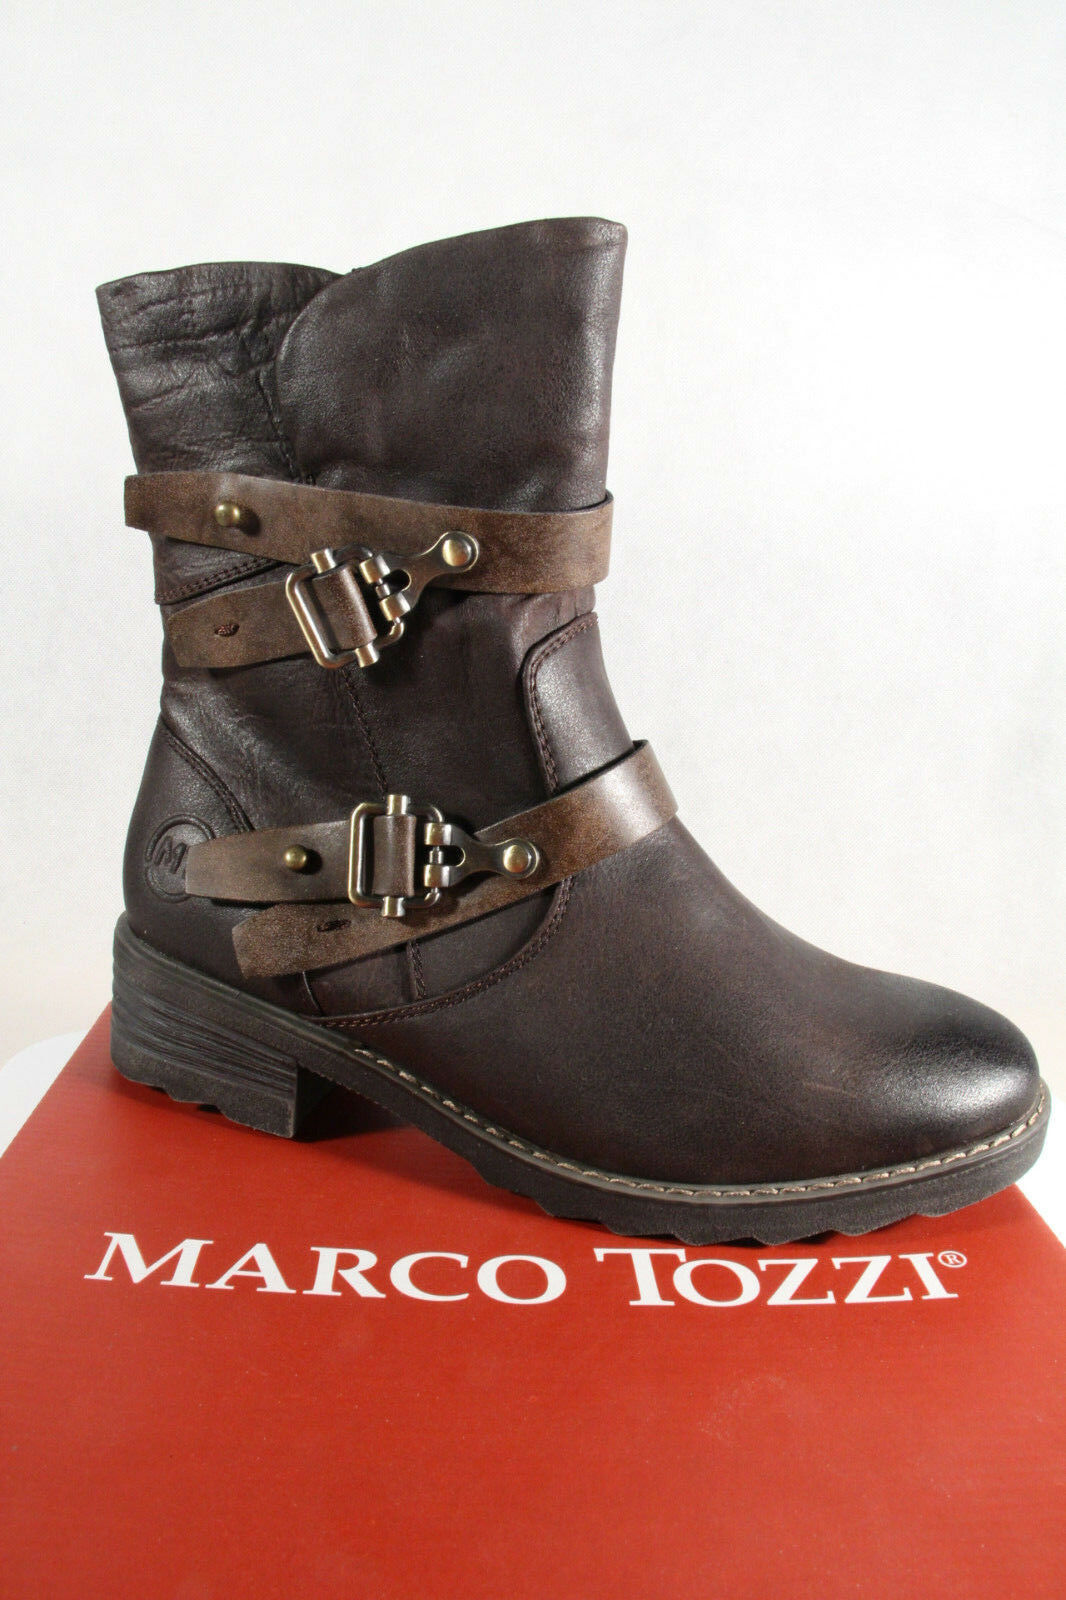 Marco Tozzi Botas, Botines, marrón, Cálido Forrado, RV 26432 NUEVO